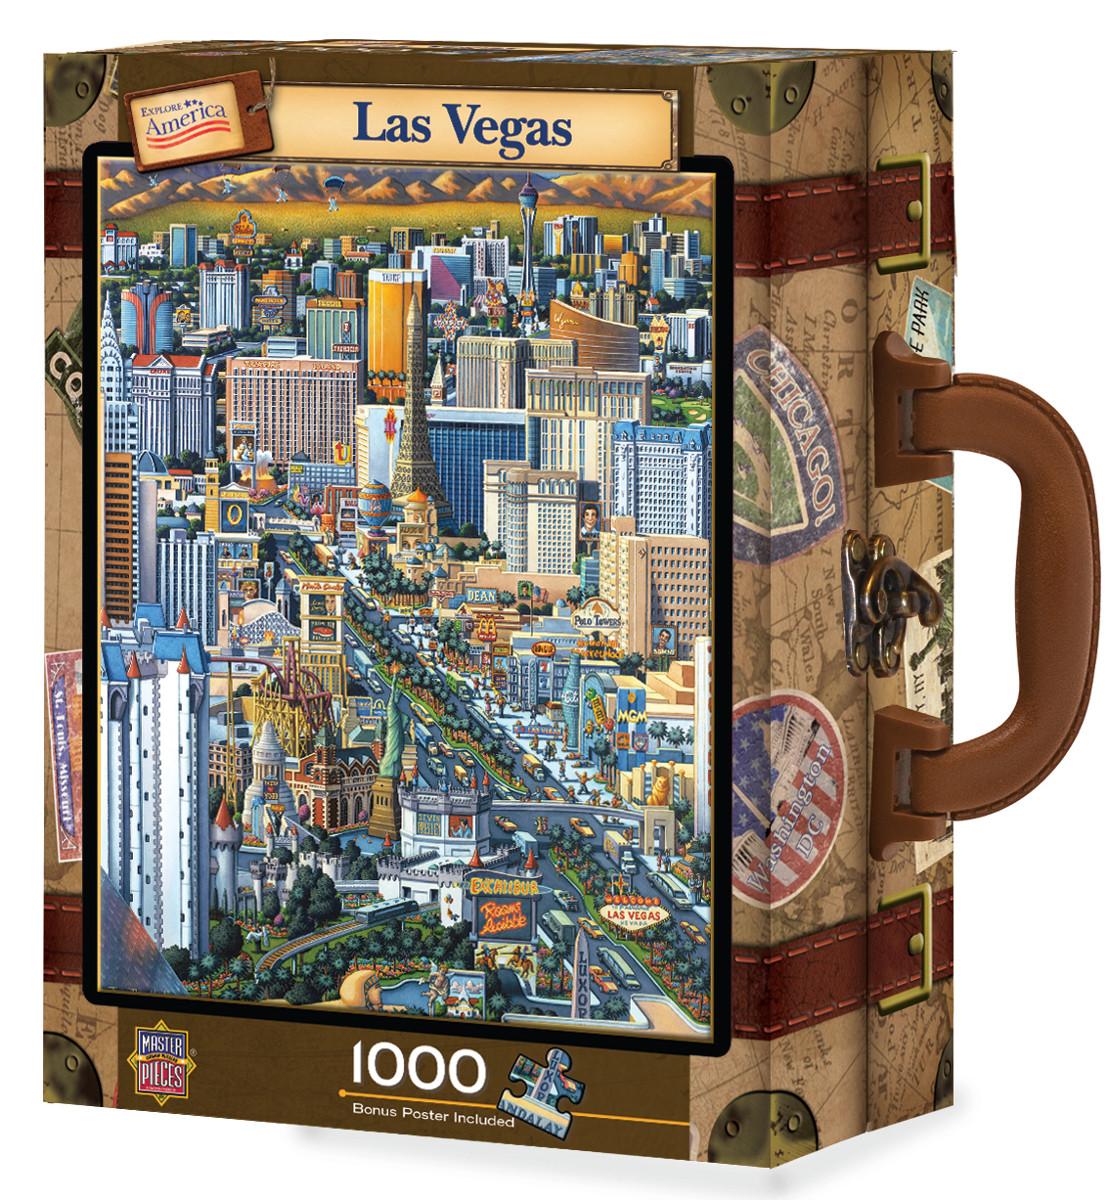 Las Vegas, Luggage Edition Las Vegas Collectible Packaging